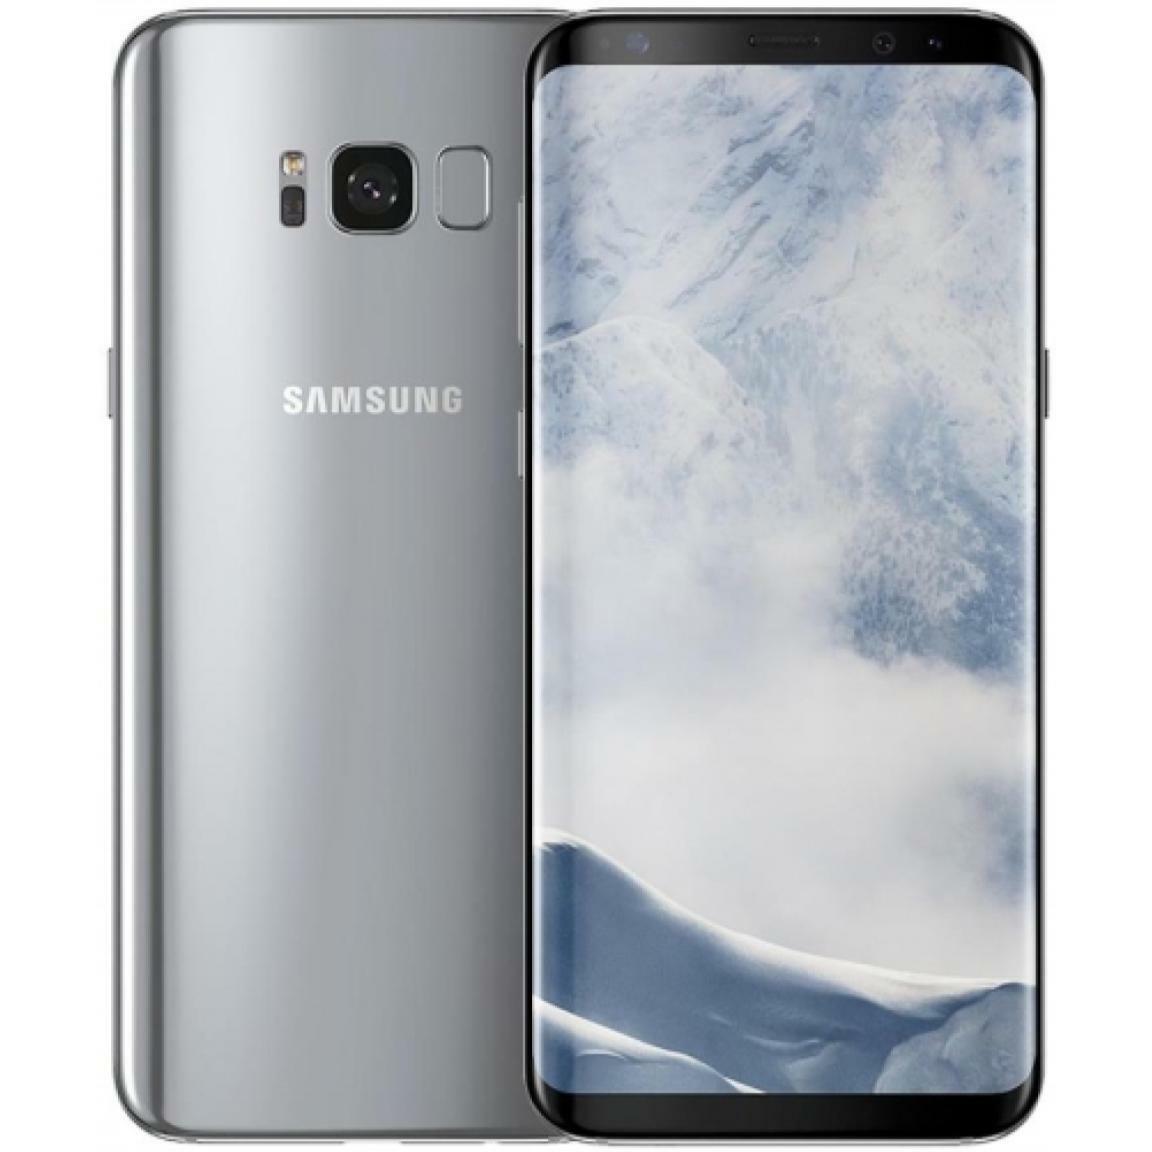 Android Phone - Samsung Galaxy S8 Plus - Silver - 64GB - Unlocked - Smartphone - G955U